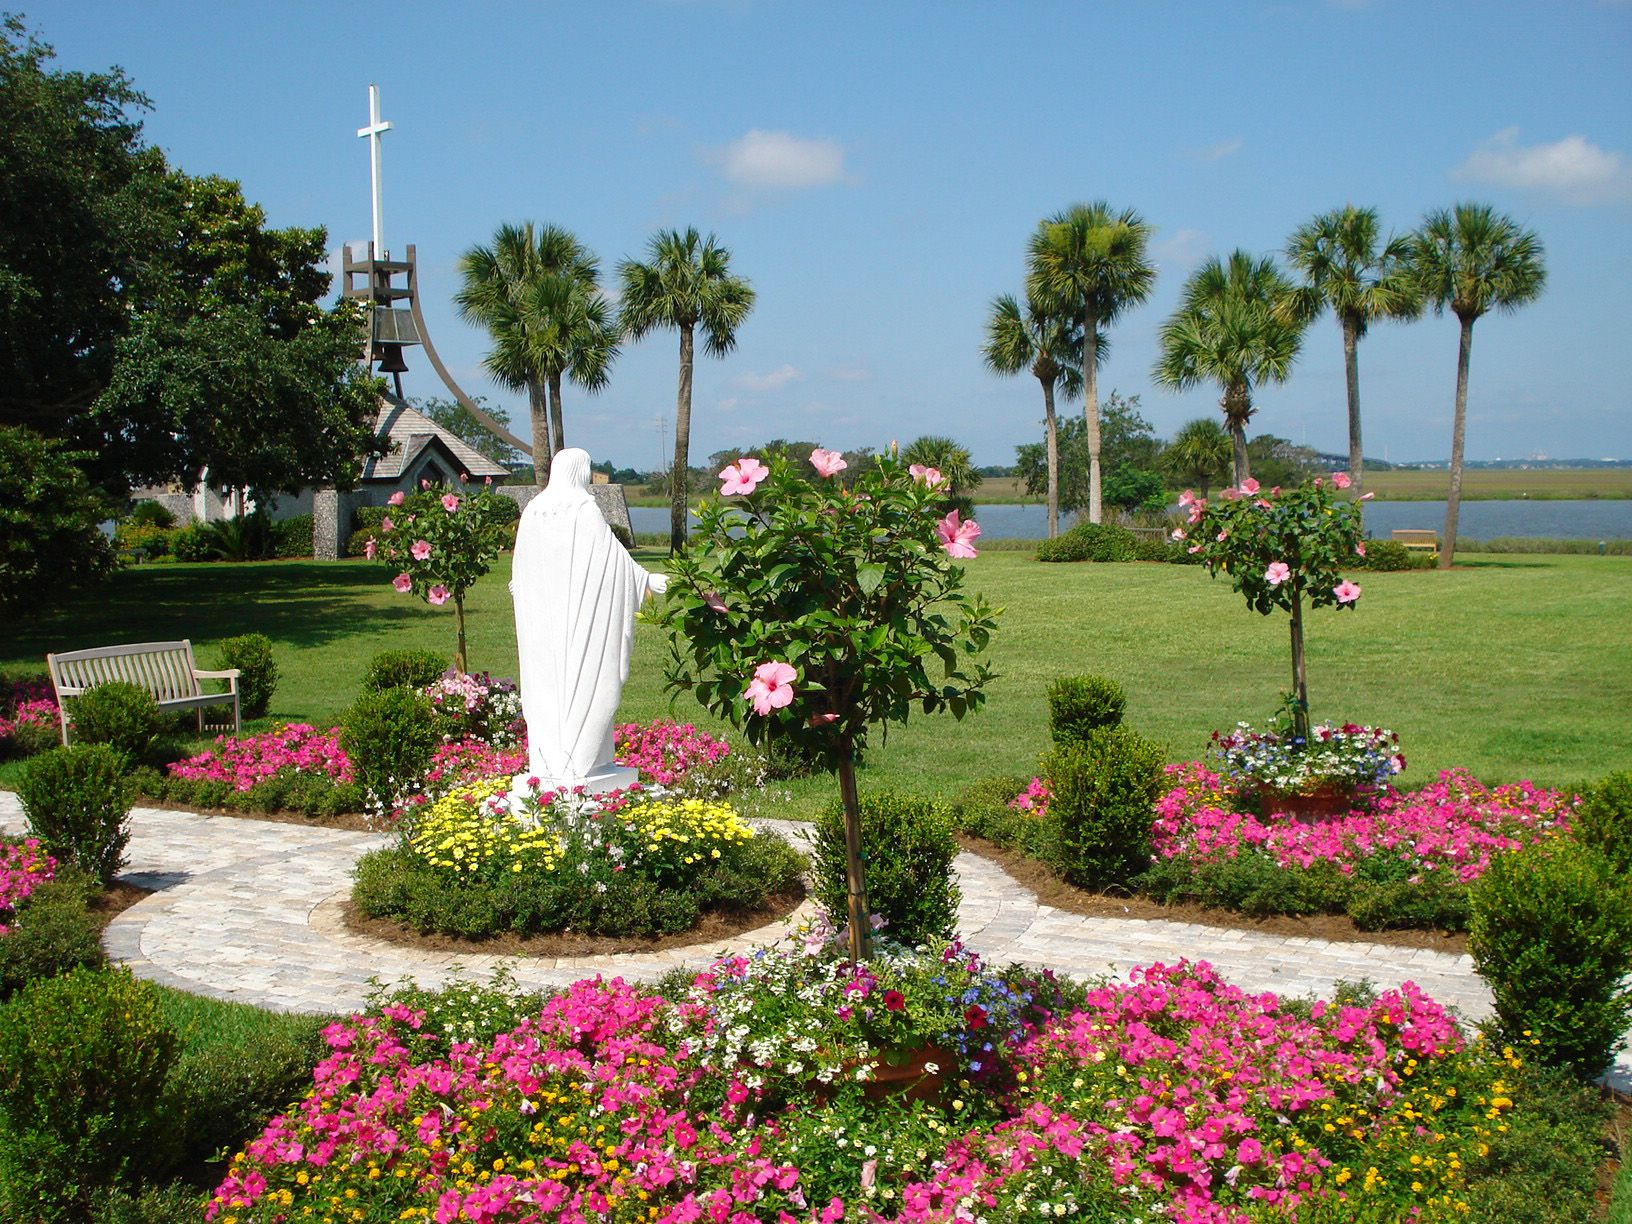 St Simons Island Methodist Retreat Center